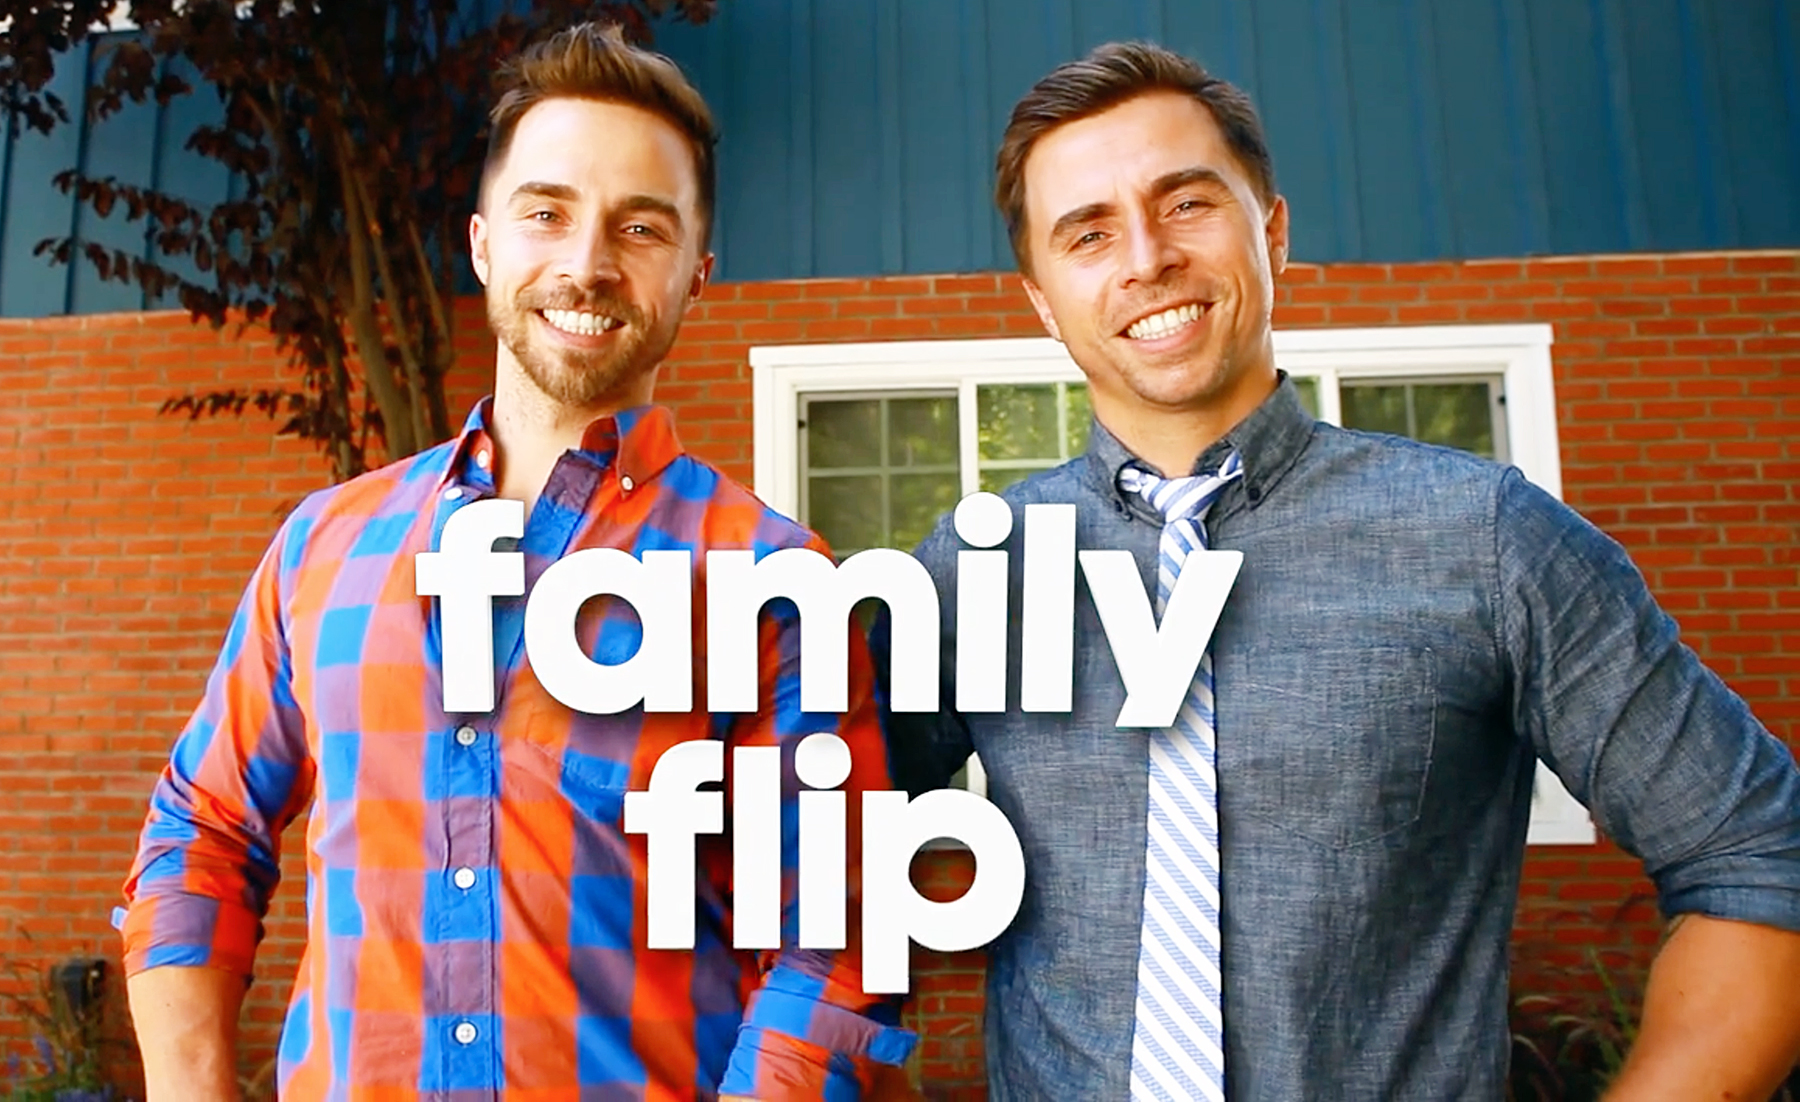 Michael Dionne Christopher Dionne HGTV Family Flip